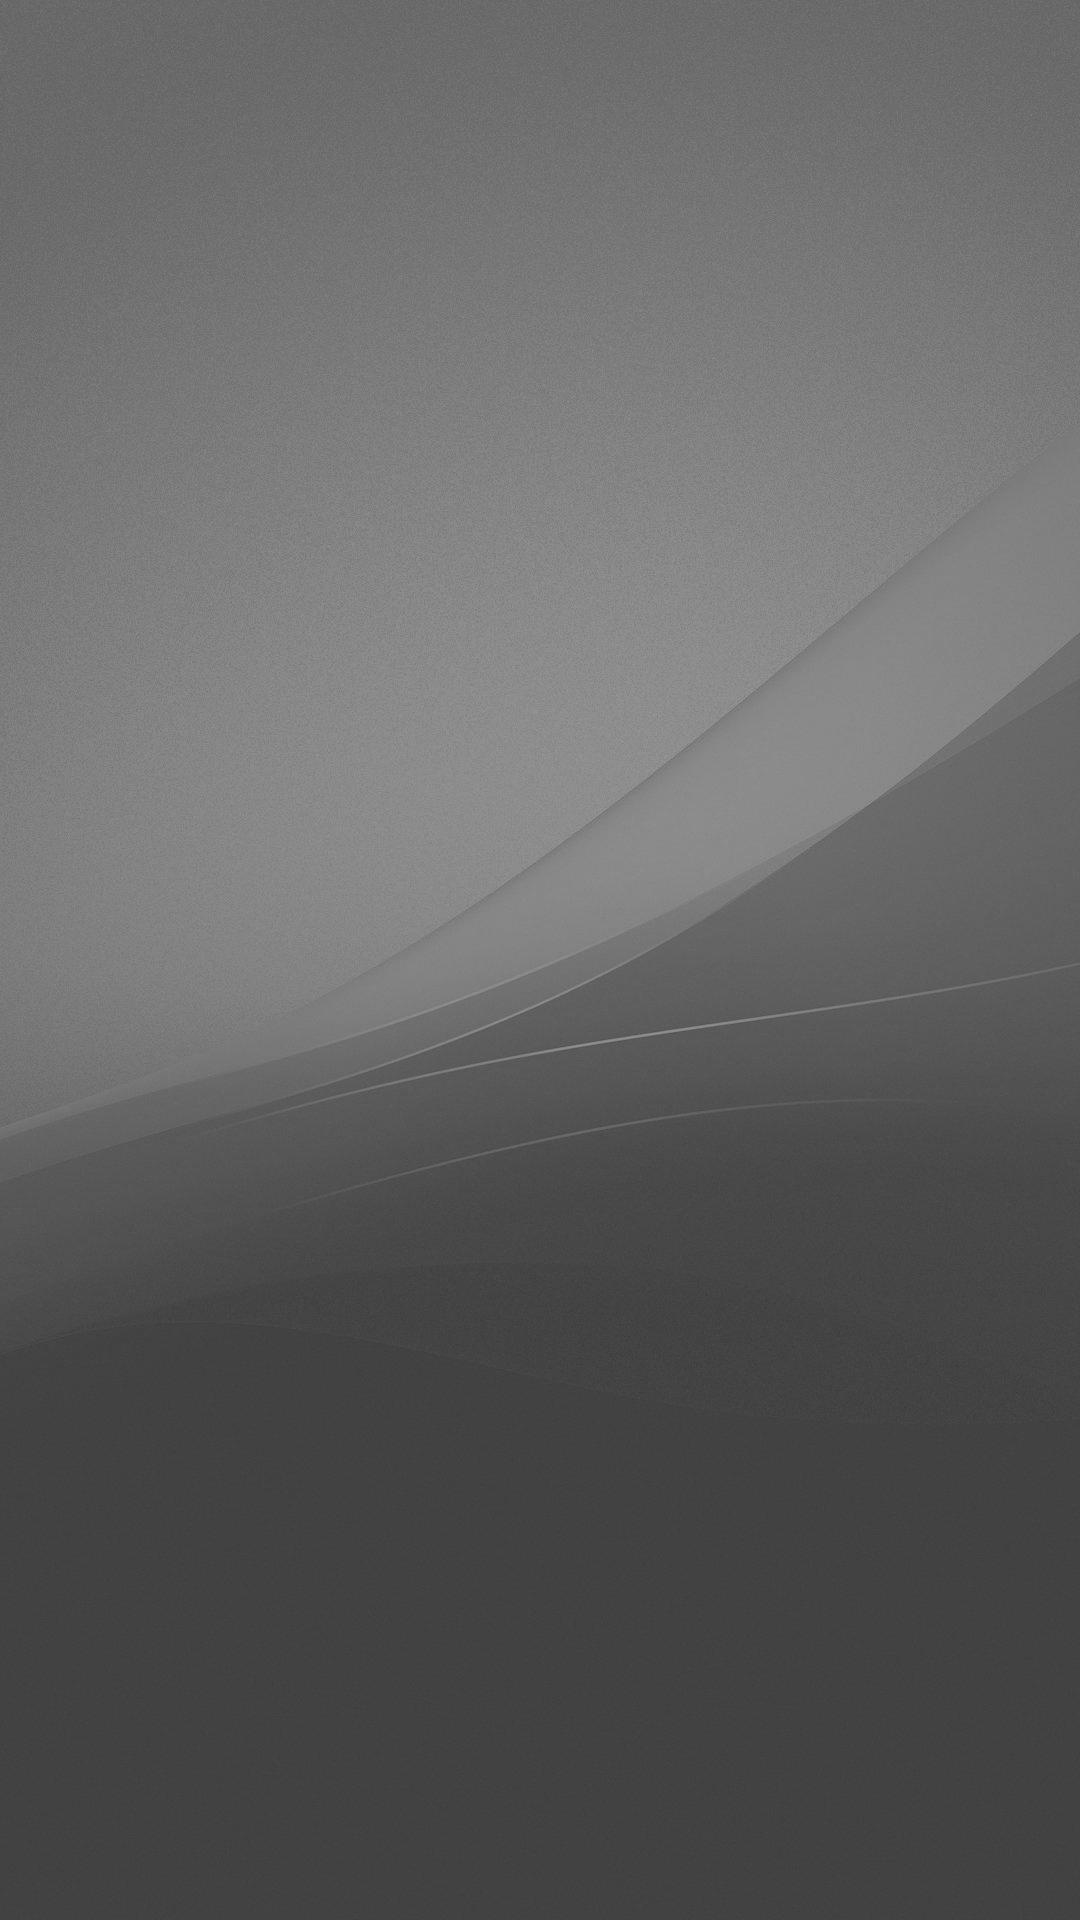 Windows 8 Lock Screen Wallpaper 1080p